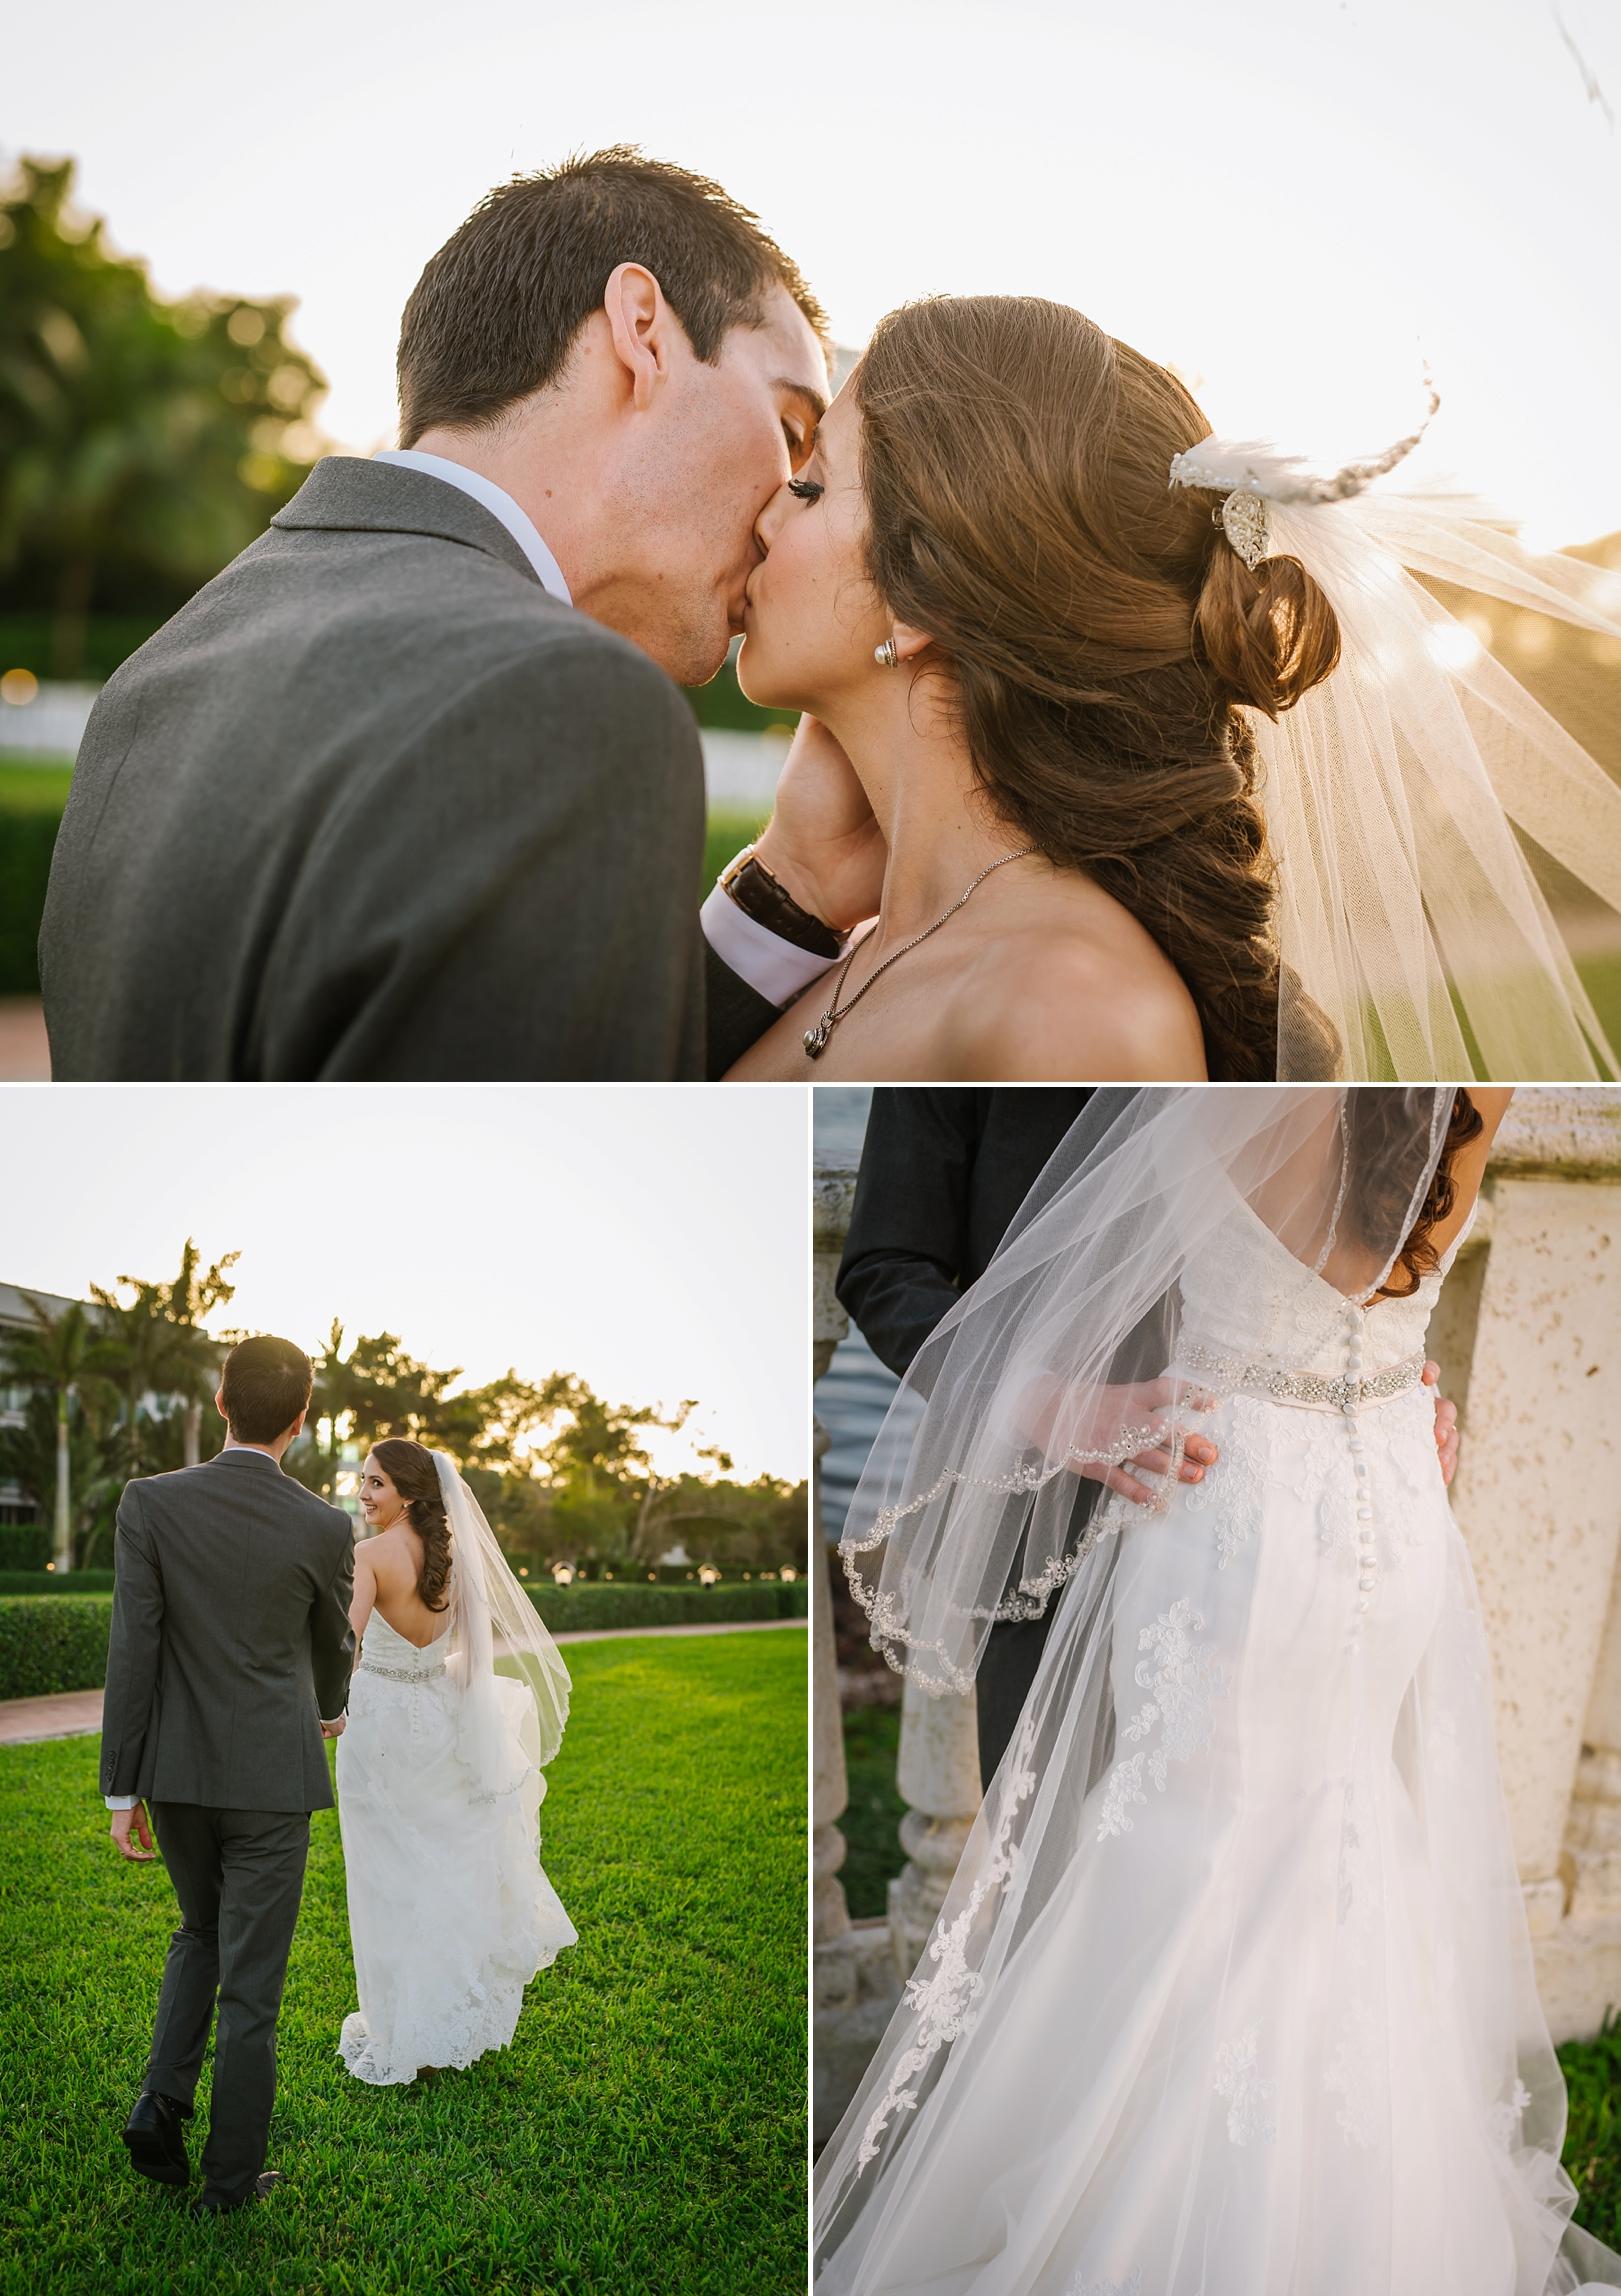 miami-wedding-photography-ashlee-hamon-elegant-vintage-antique-wedding_0021.jpg